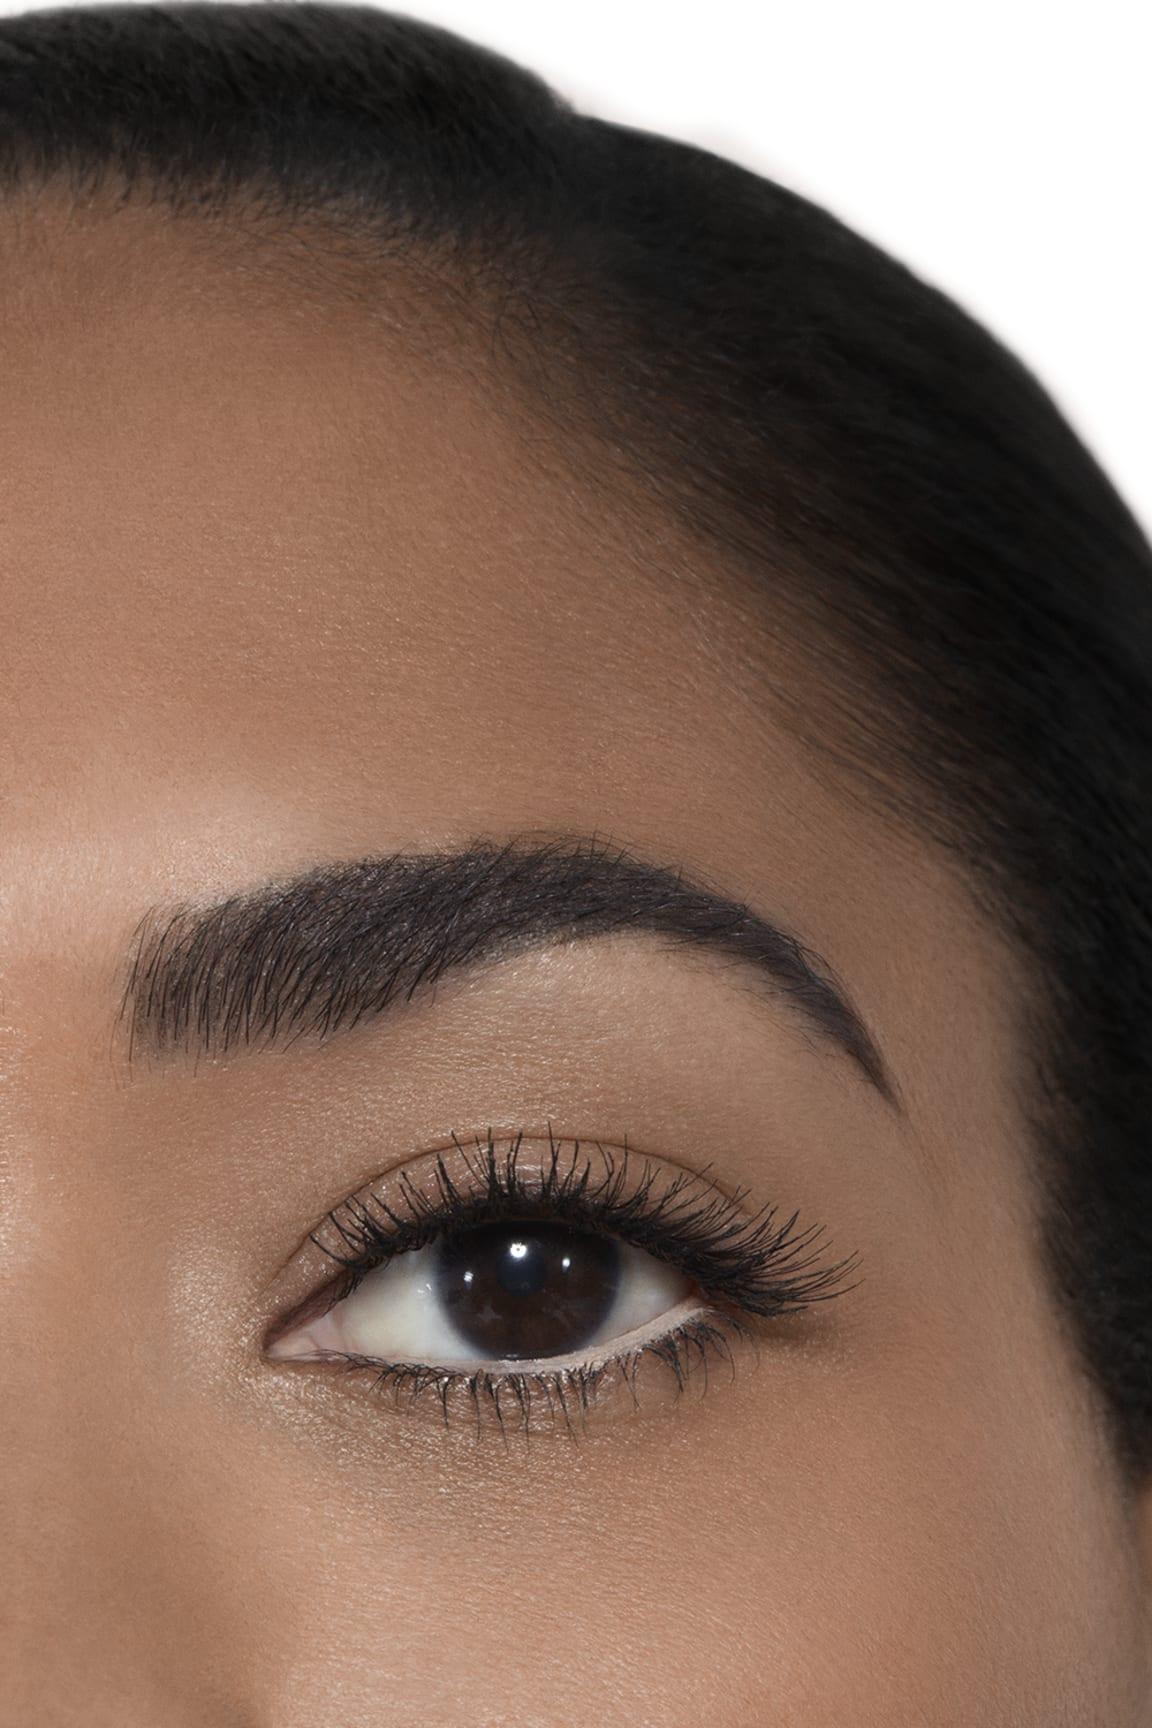 Application makeup visual 2 - LE CRAYON KHÔL 69 - CLAIR